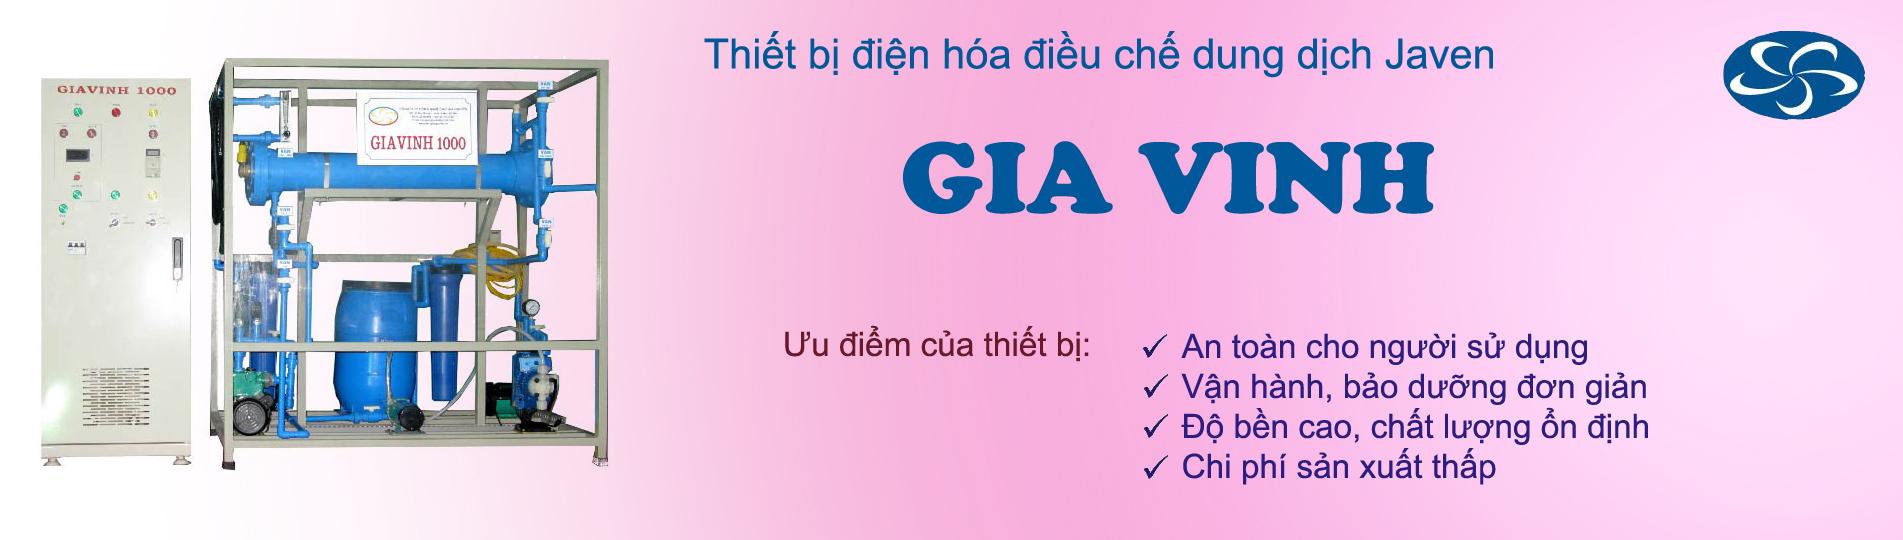 http://gianguyen.vn/thiet-bi-san-xuat-dung-dich-javen